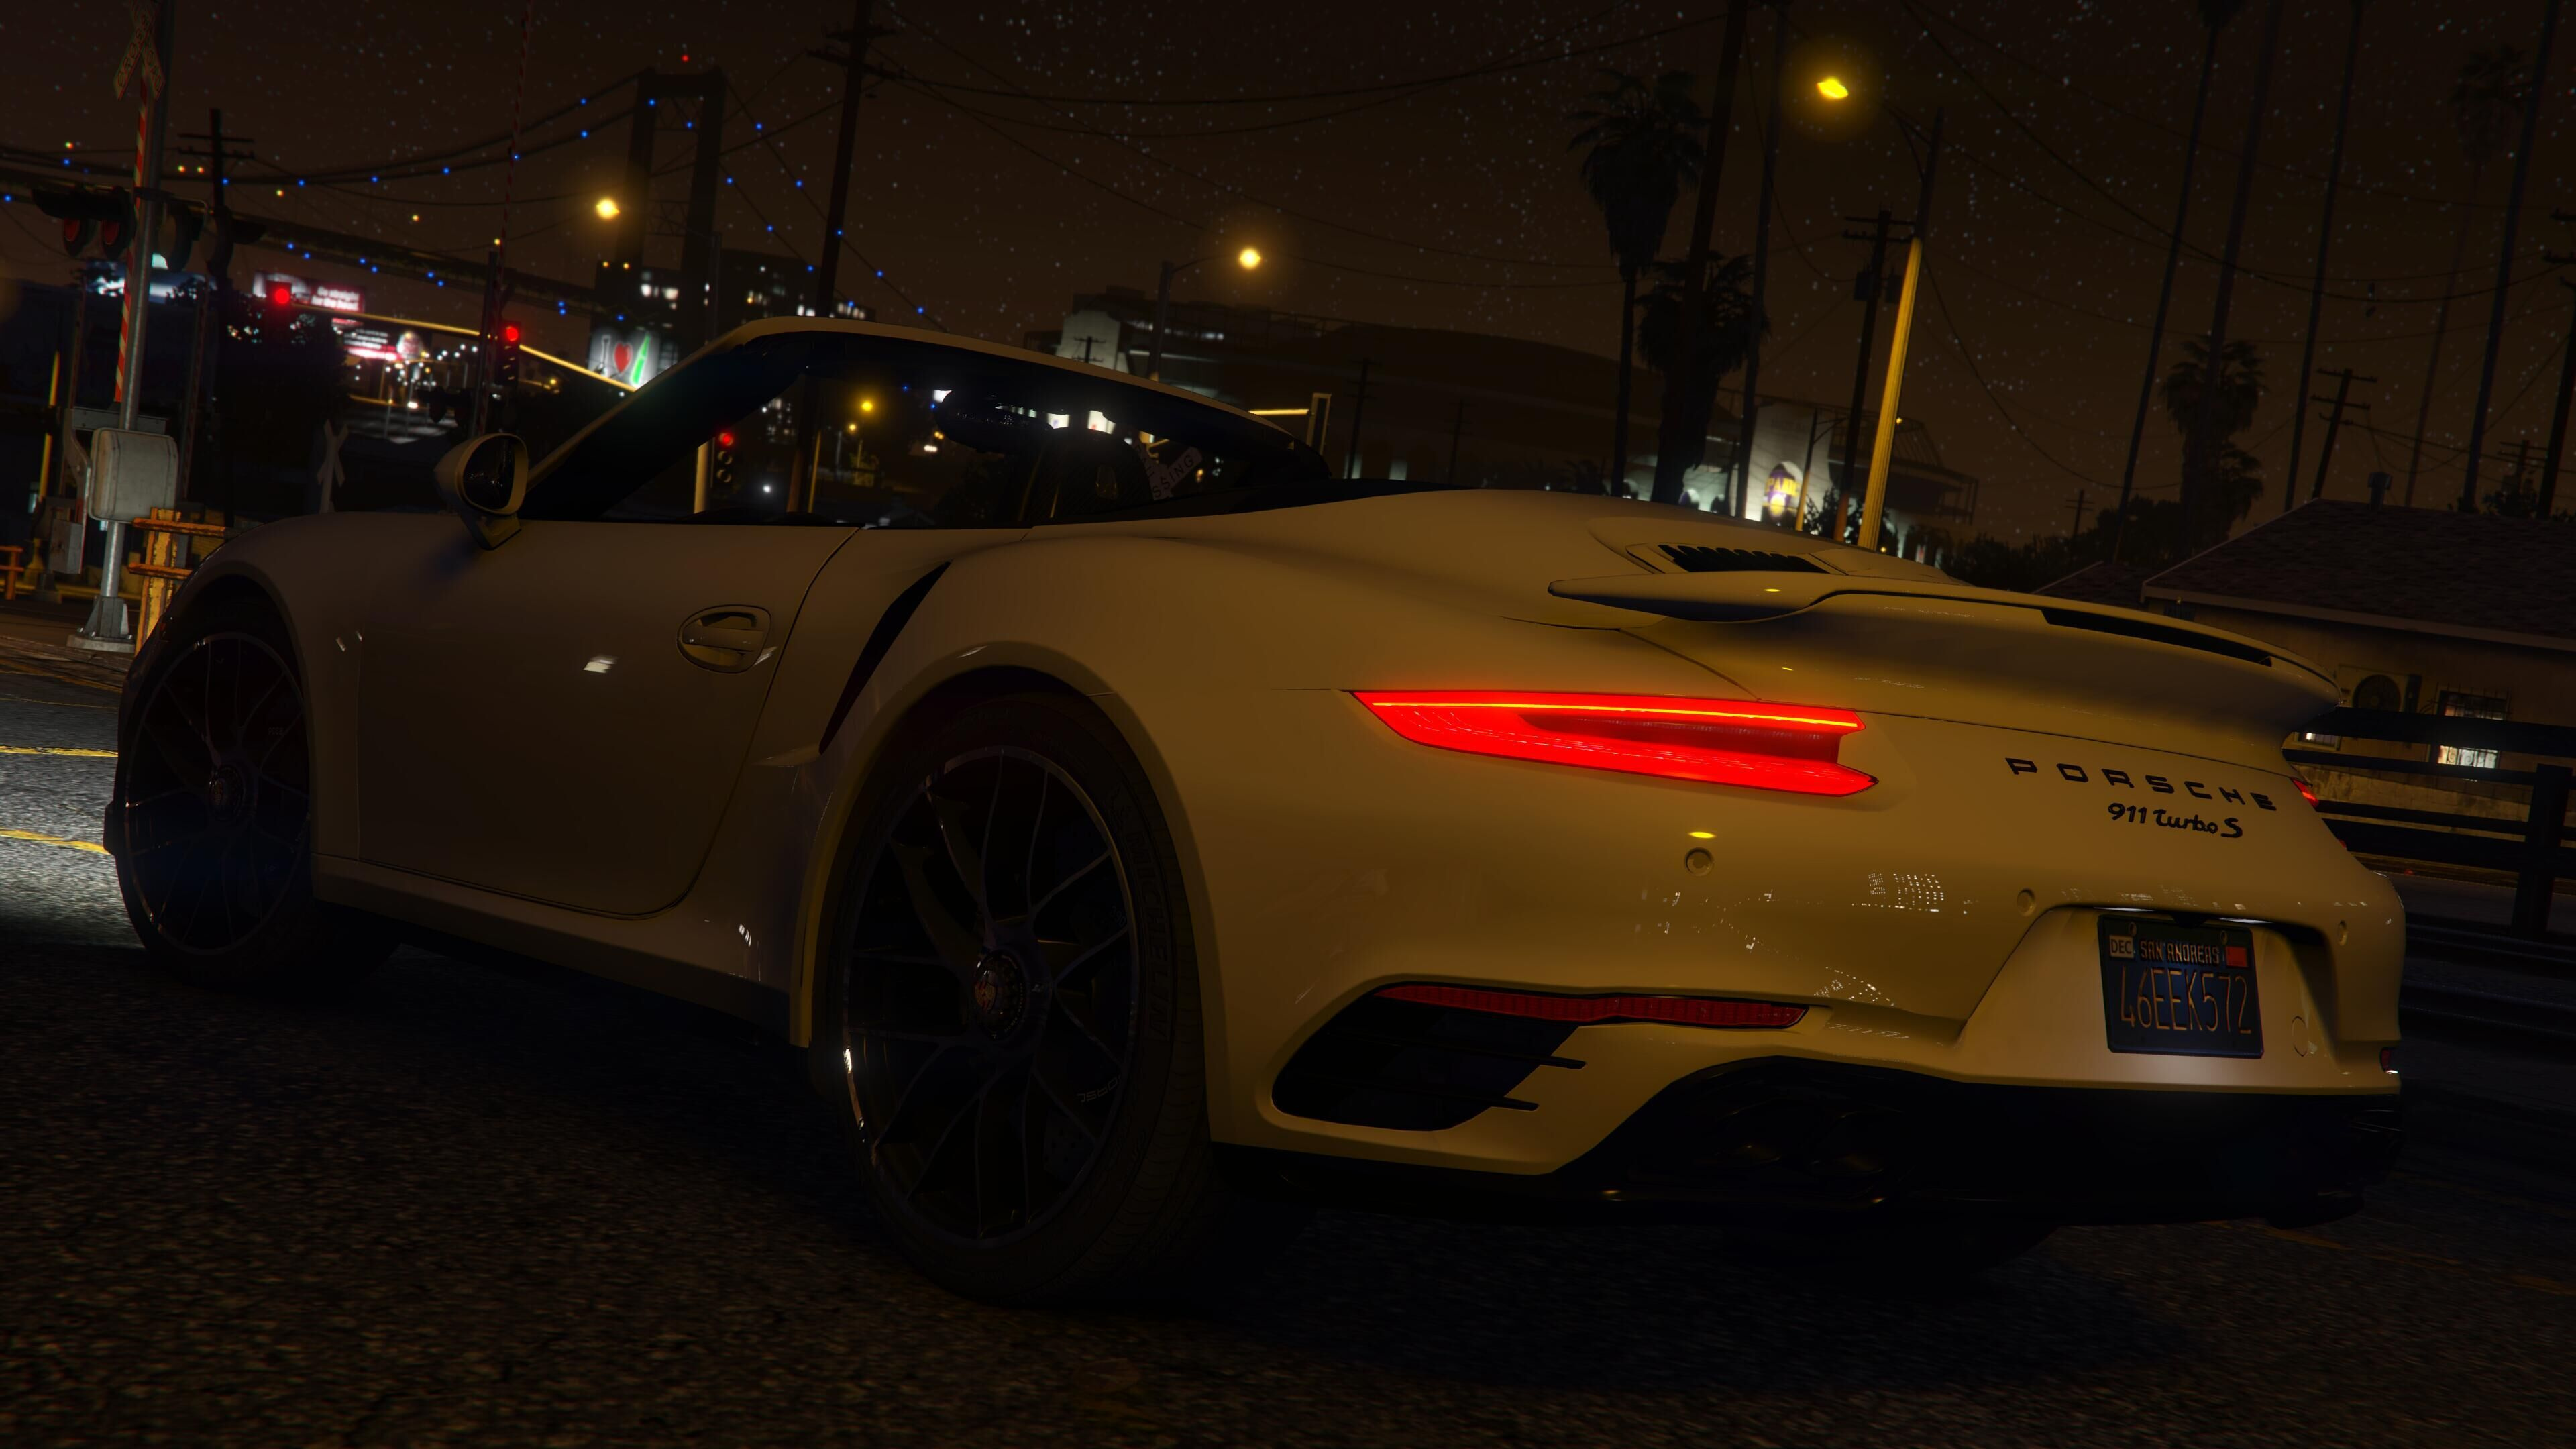 826f77 qq20160604155624 - Porsche 911 Turbo S